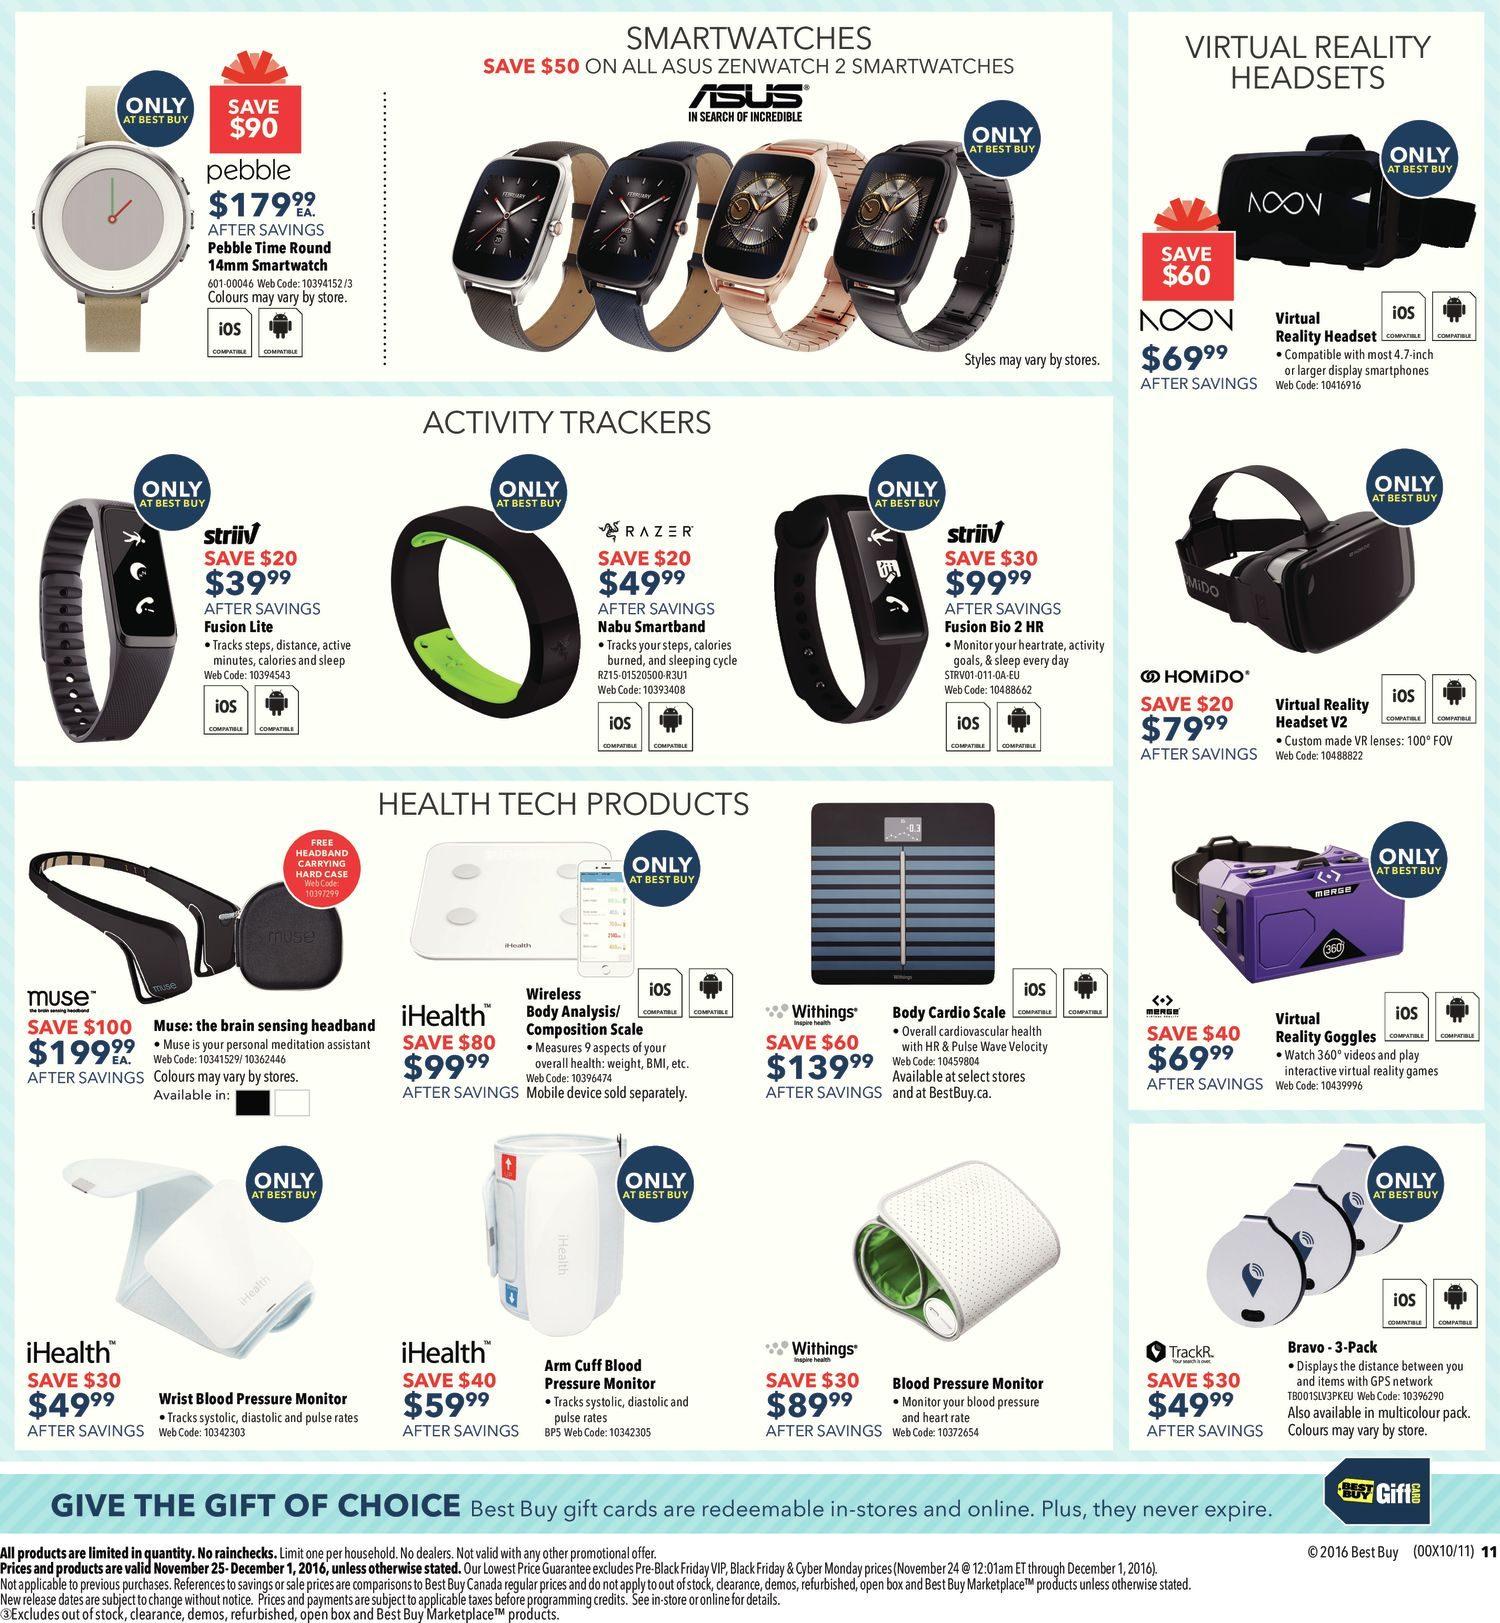 Best buy weekly flyer weekly black friday sale nov 25 dec 1 best buy weekly flyer weekly black friday sale nov 25 dec 1 redflagdeals fandeluxe Gallery